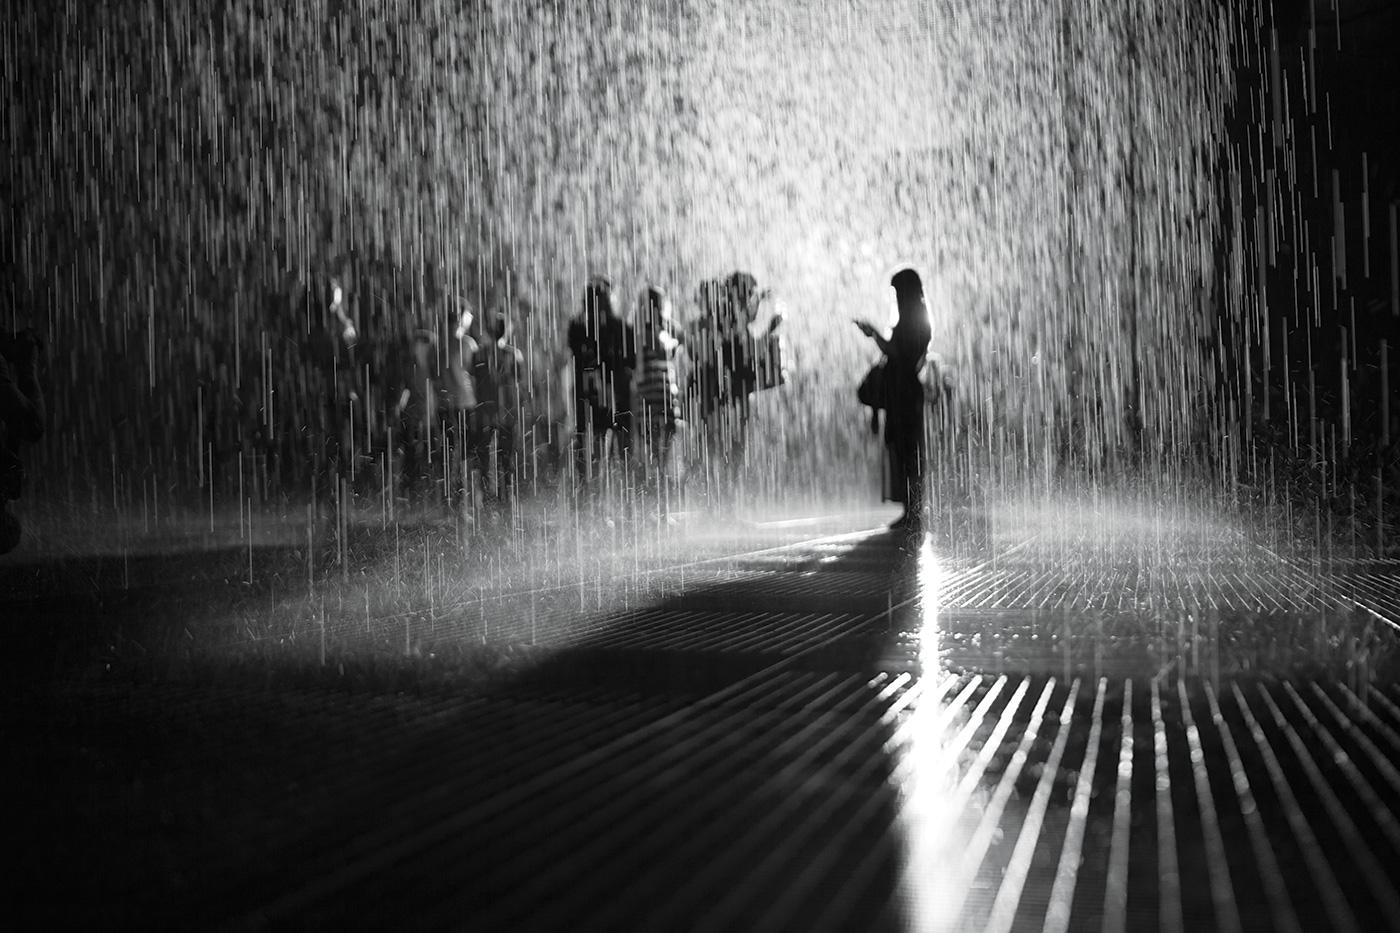 Rain Room by Random International (2012). Rain Room at Yuz Museum. Photo: Delia Keller